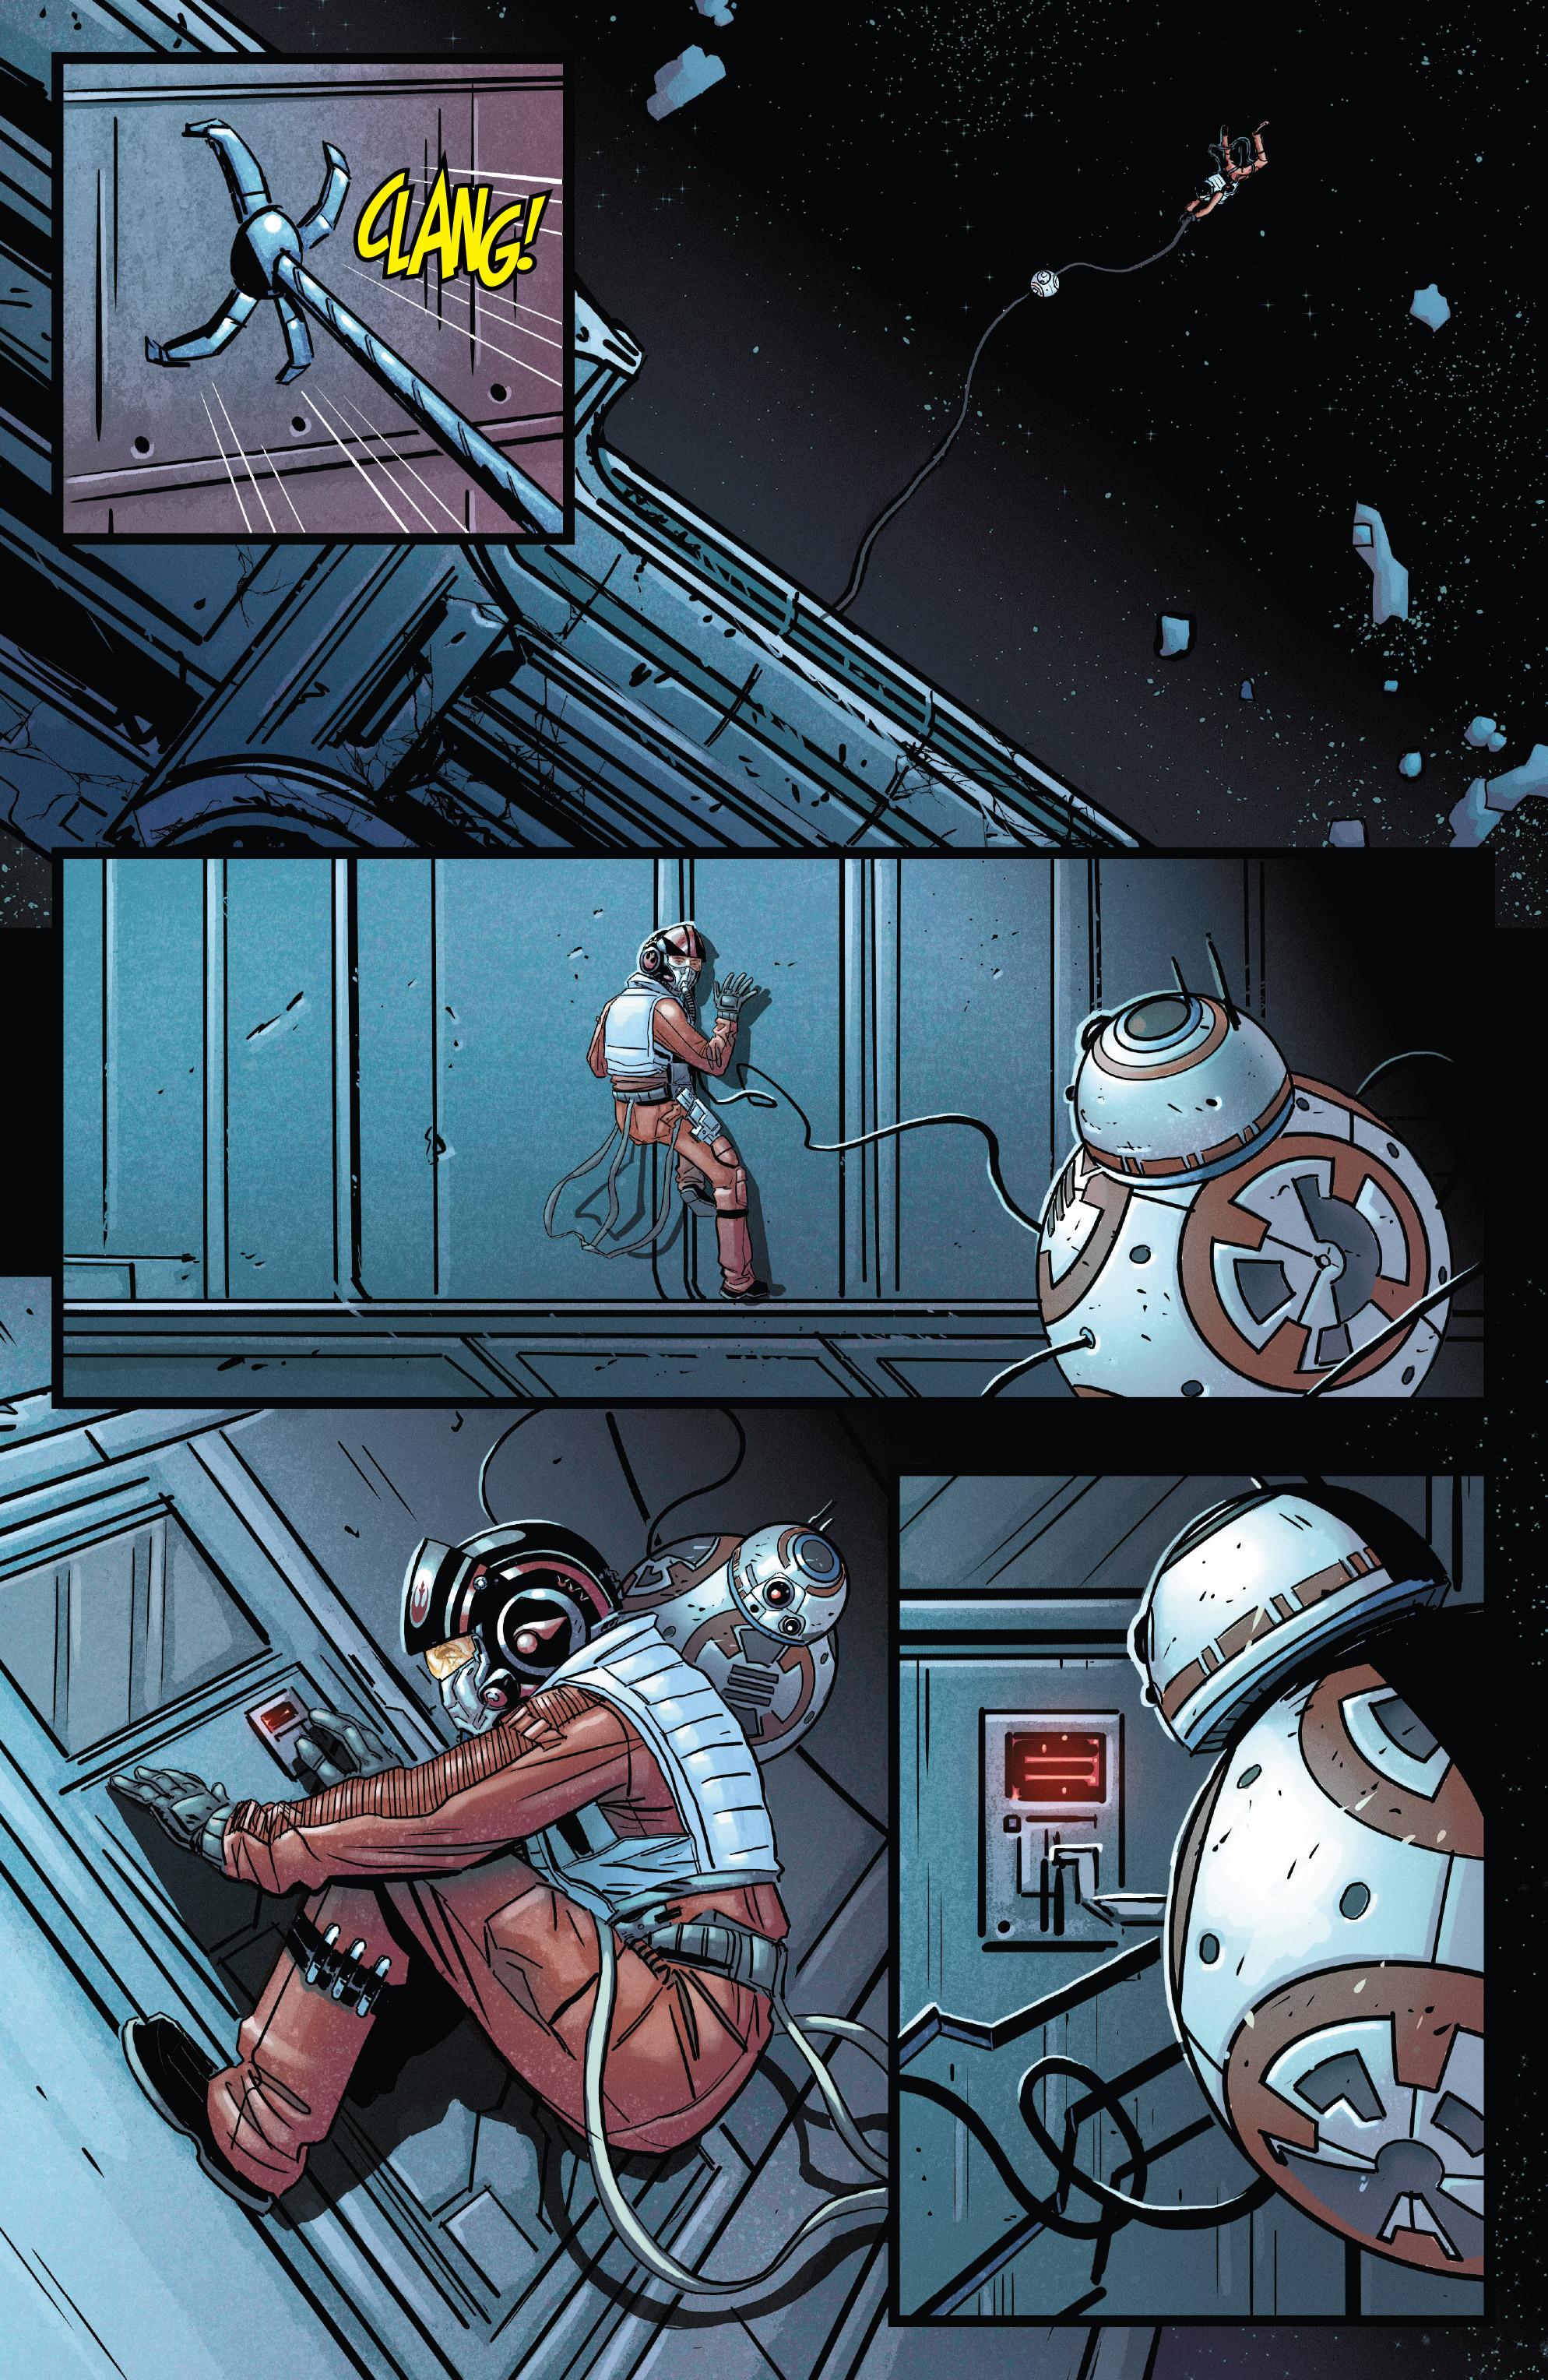 Read online Star Wars: Poe Dameron comic -  Issue # _Annual 1 - 12